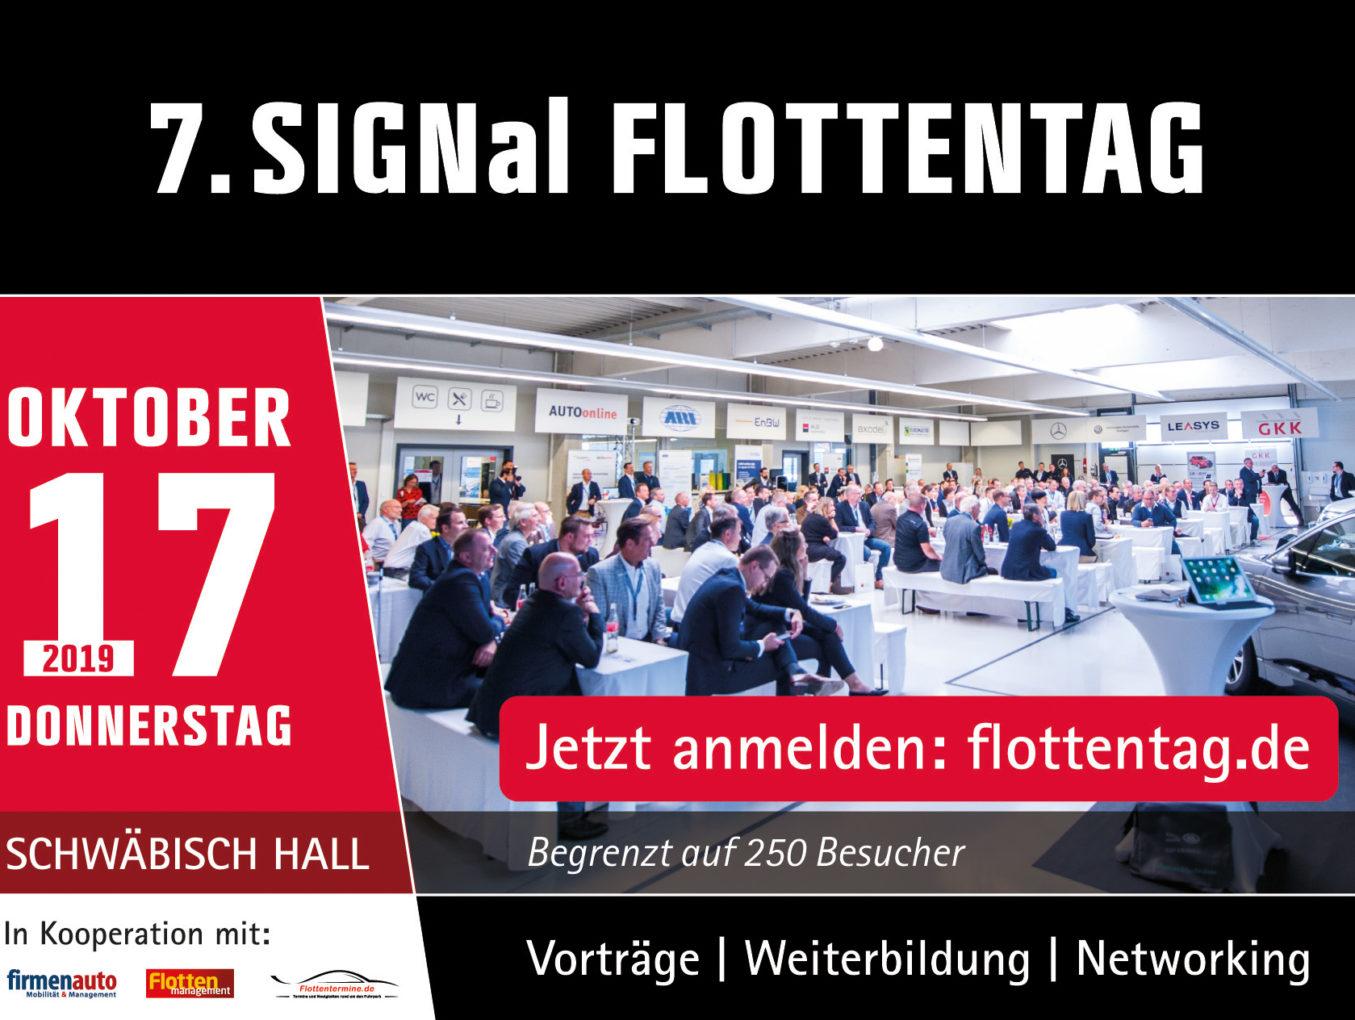 Stargäste beim 7. SIGNal Flottentag!: Felix Neureuther und Jörg Bergmeister